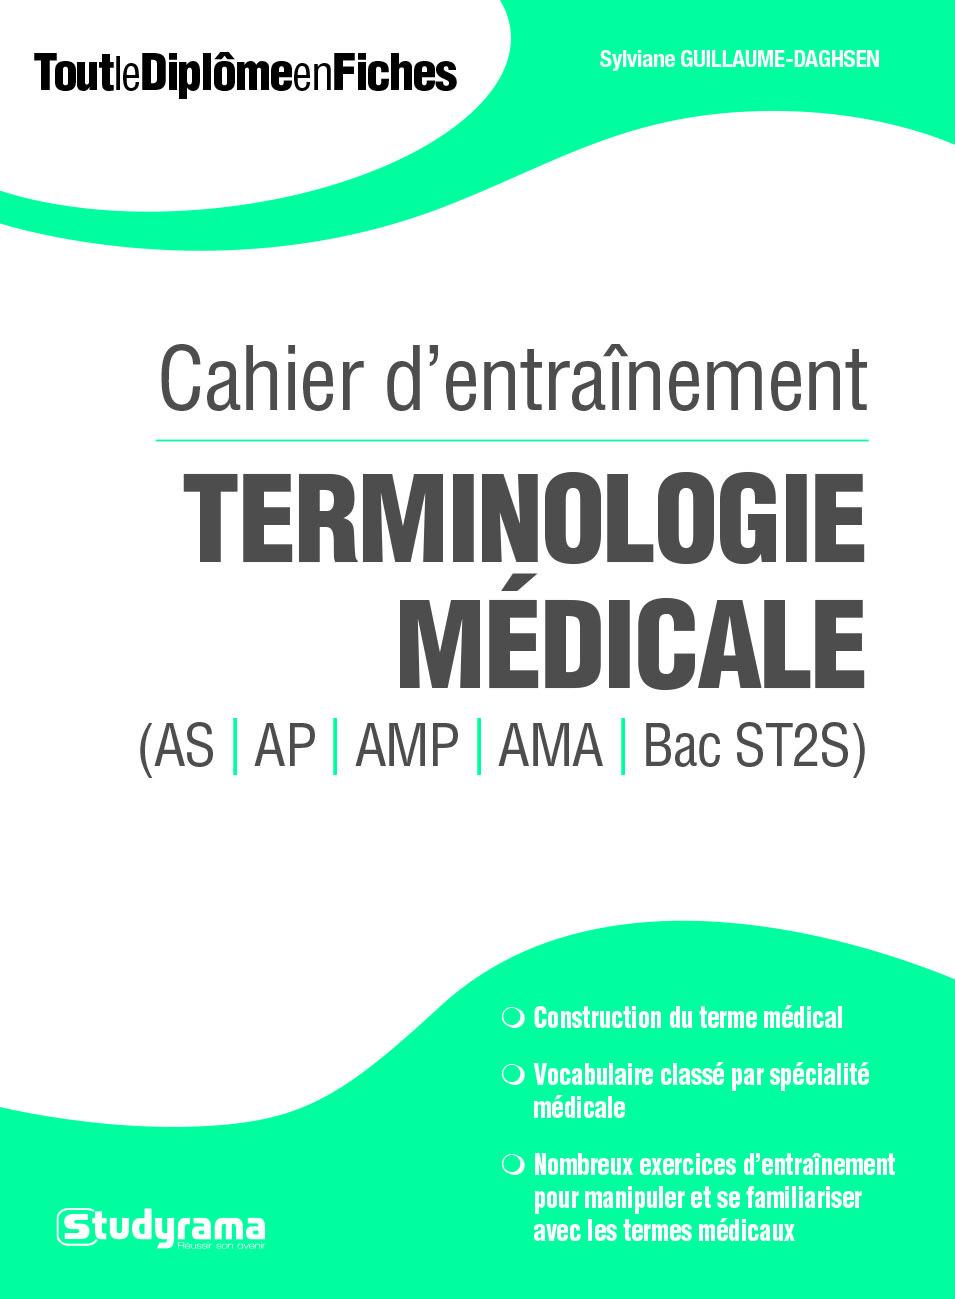 CAHIER D'ENTRAINEMENT TERMINOLOGIE MEDICALE AS AP AMP AMA BAC ST2S